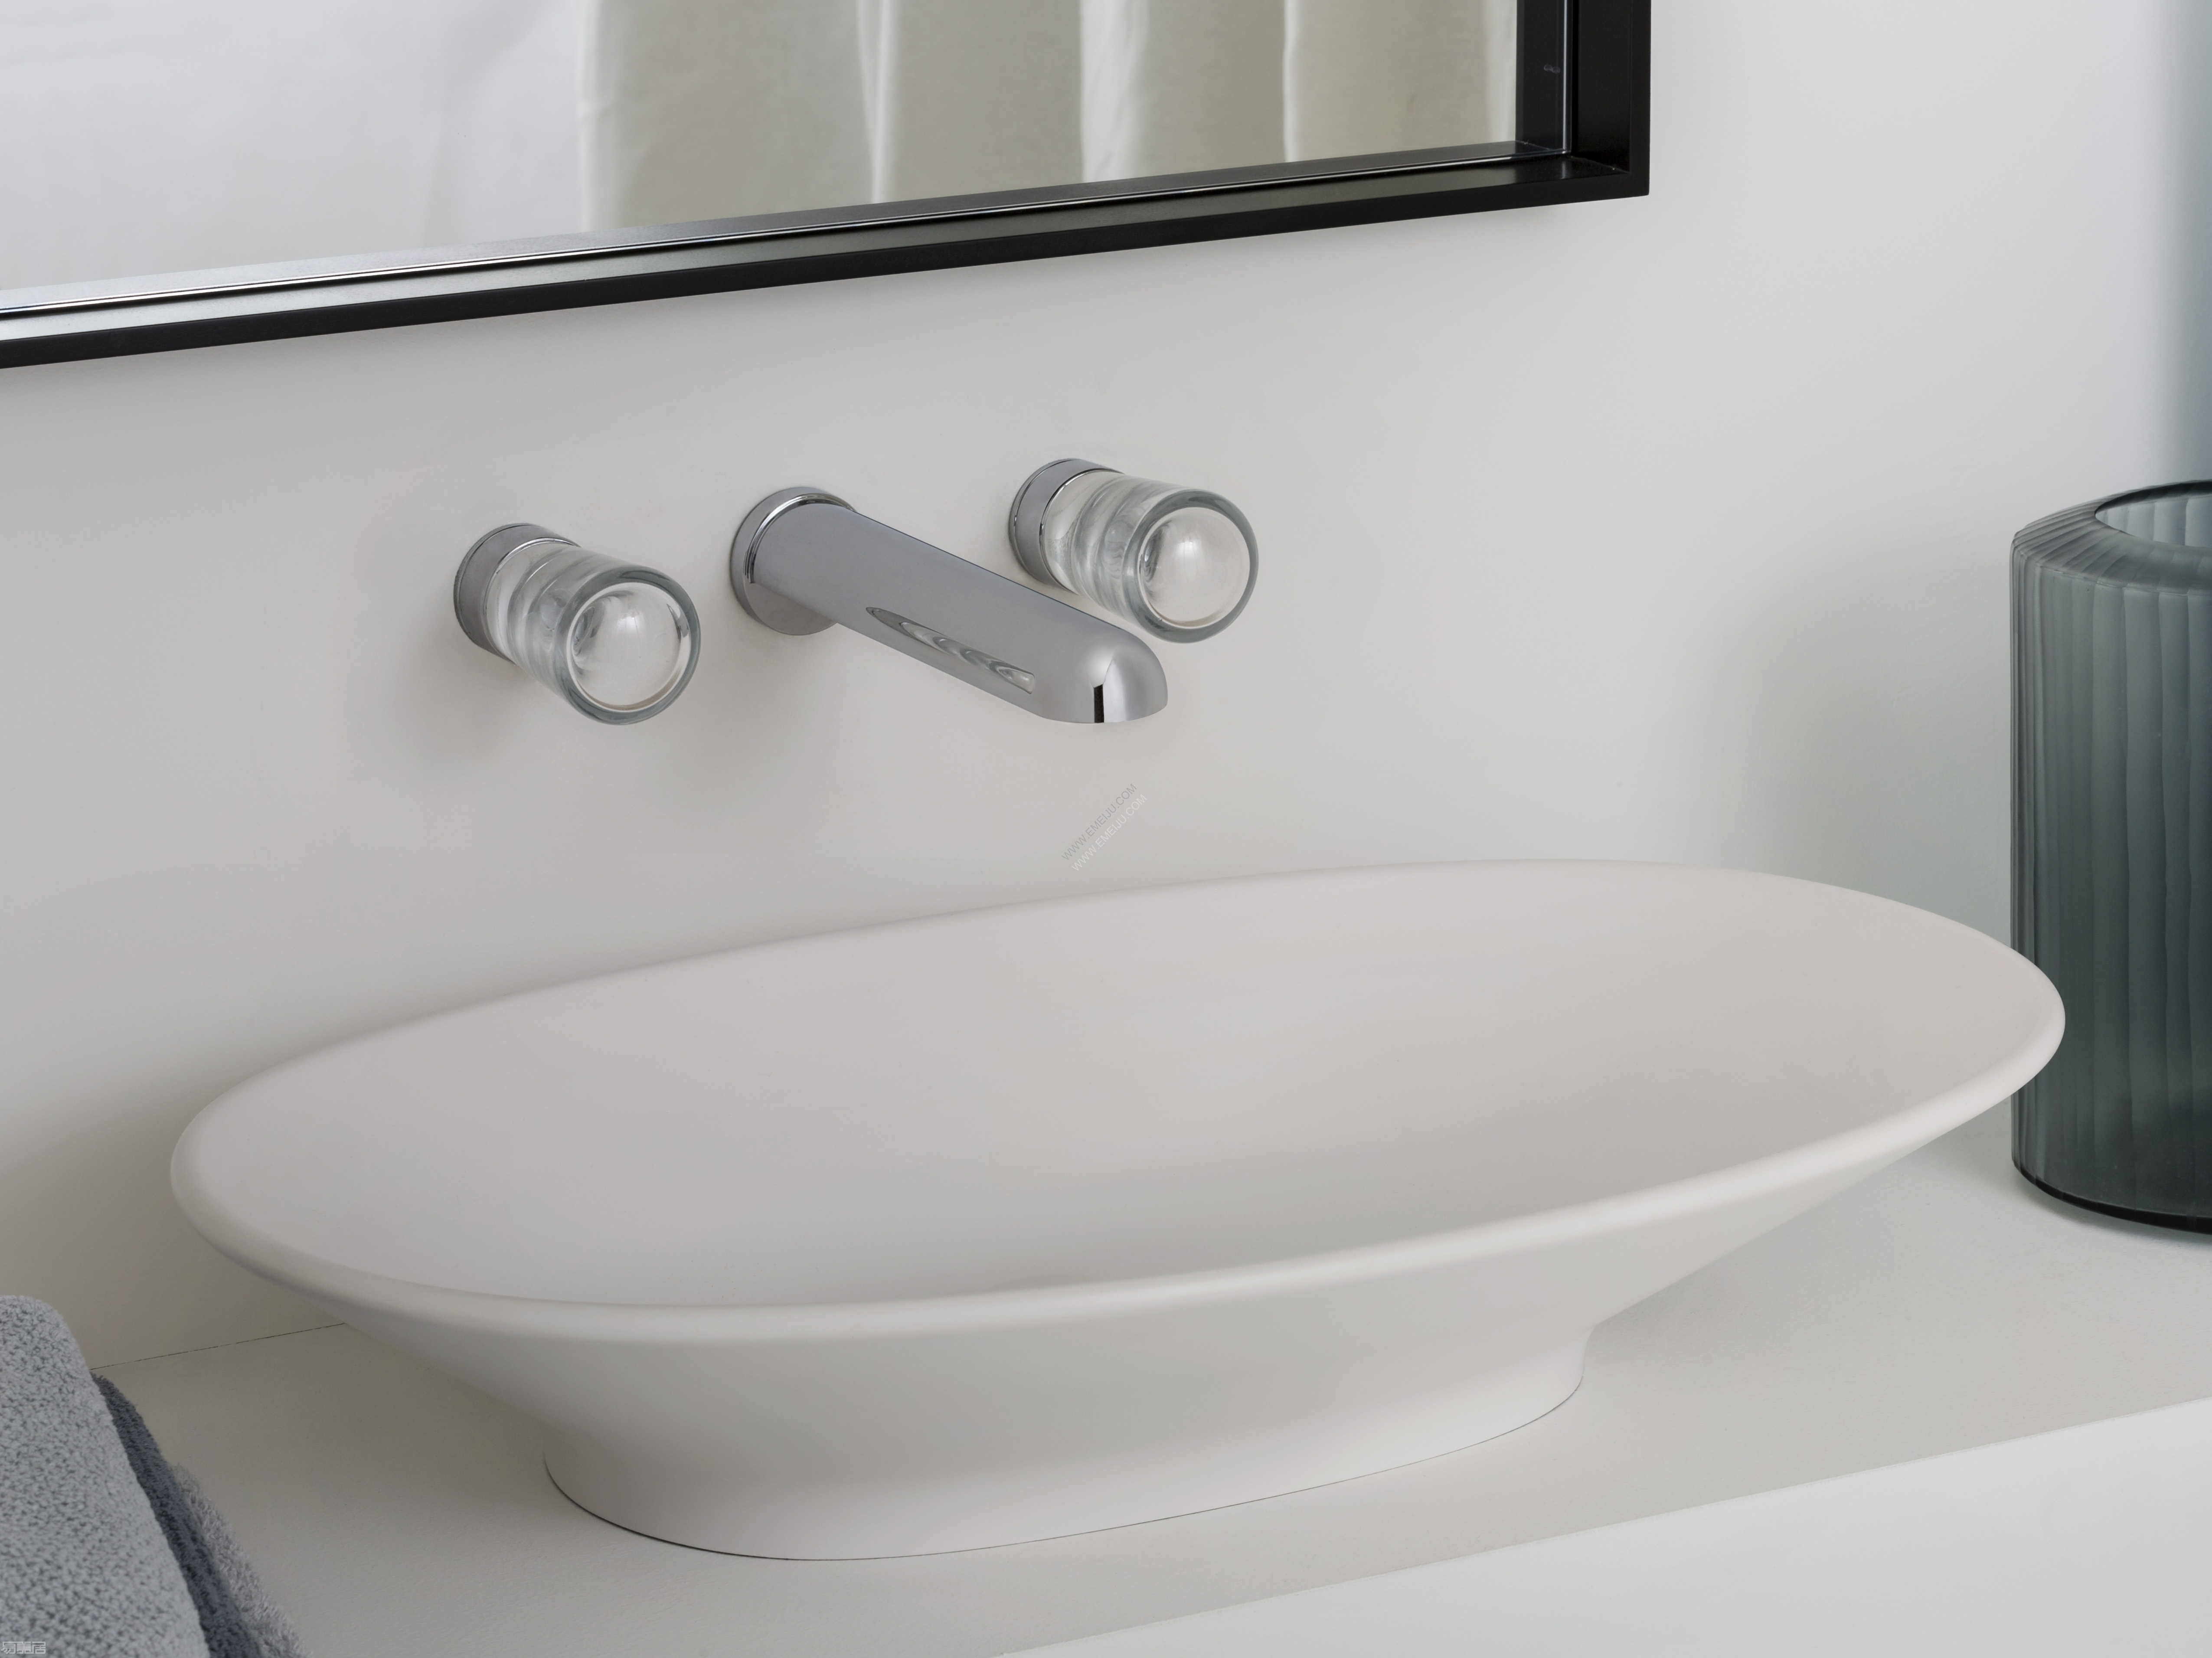 wall-mounted-washbasin-tap-zucchetti-310810-relc3bcc7d1.jpg